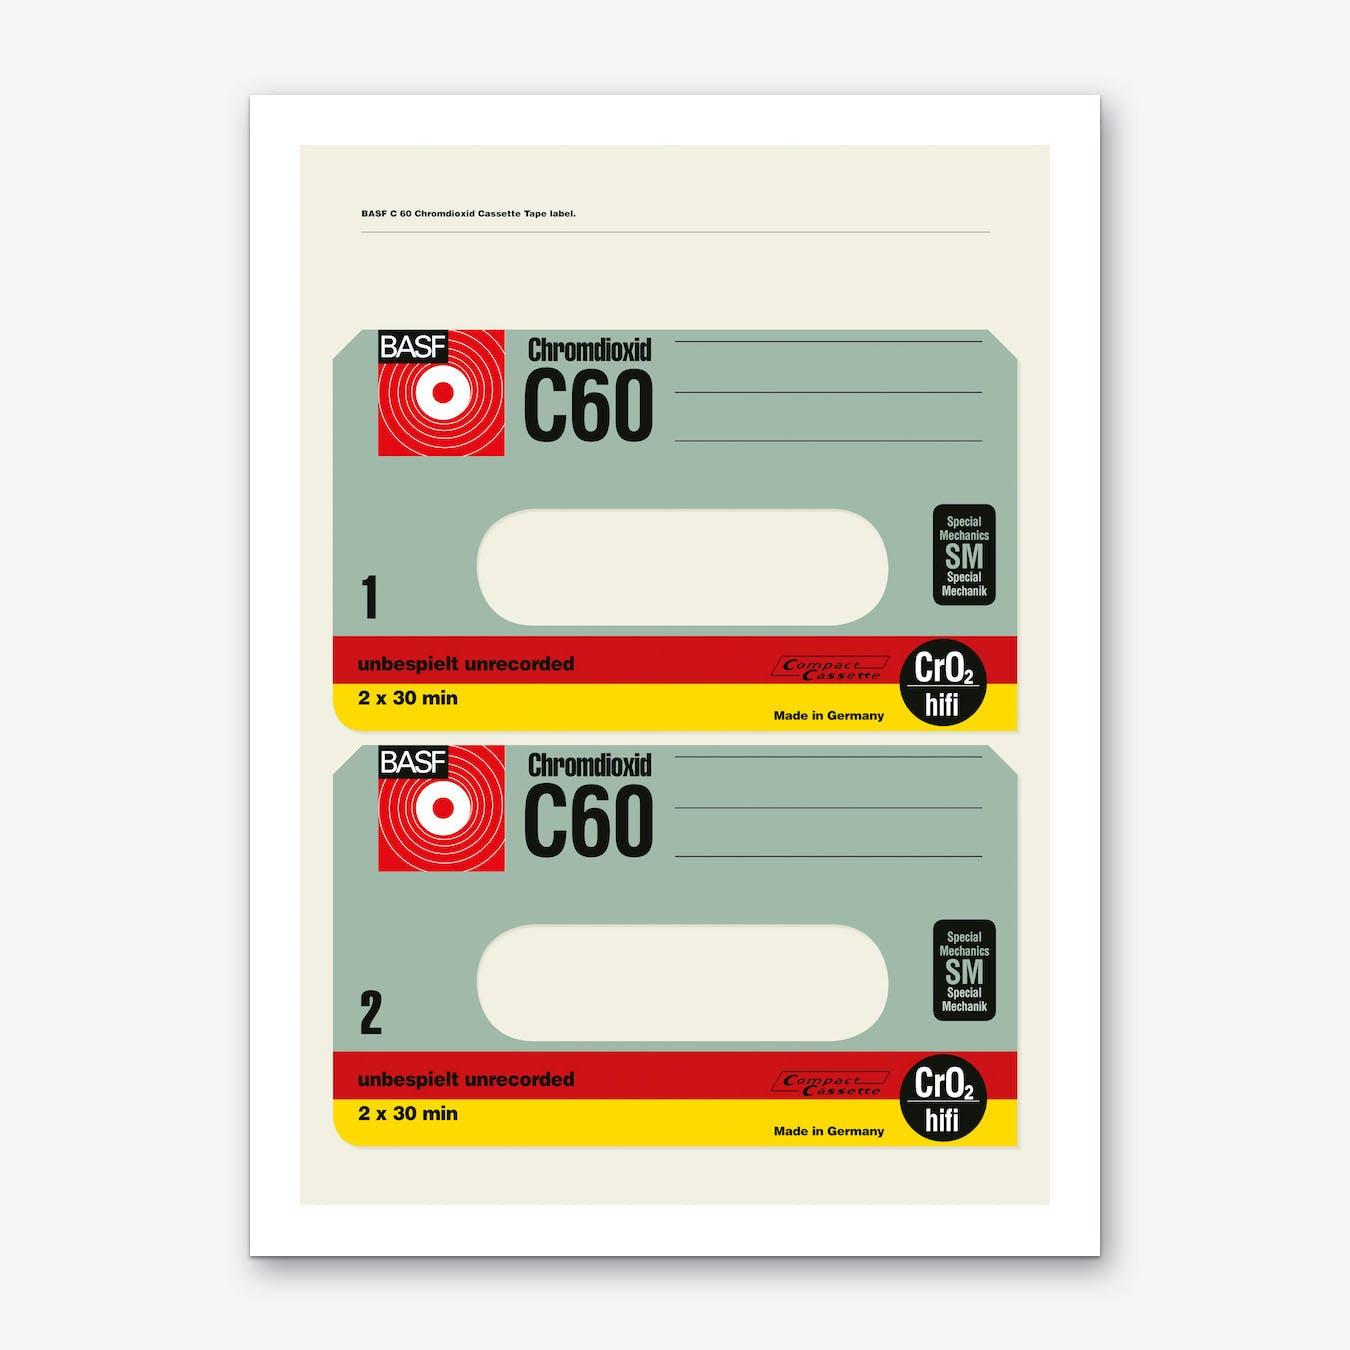 BASF C60 Chromdioxid Art Print